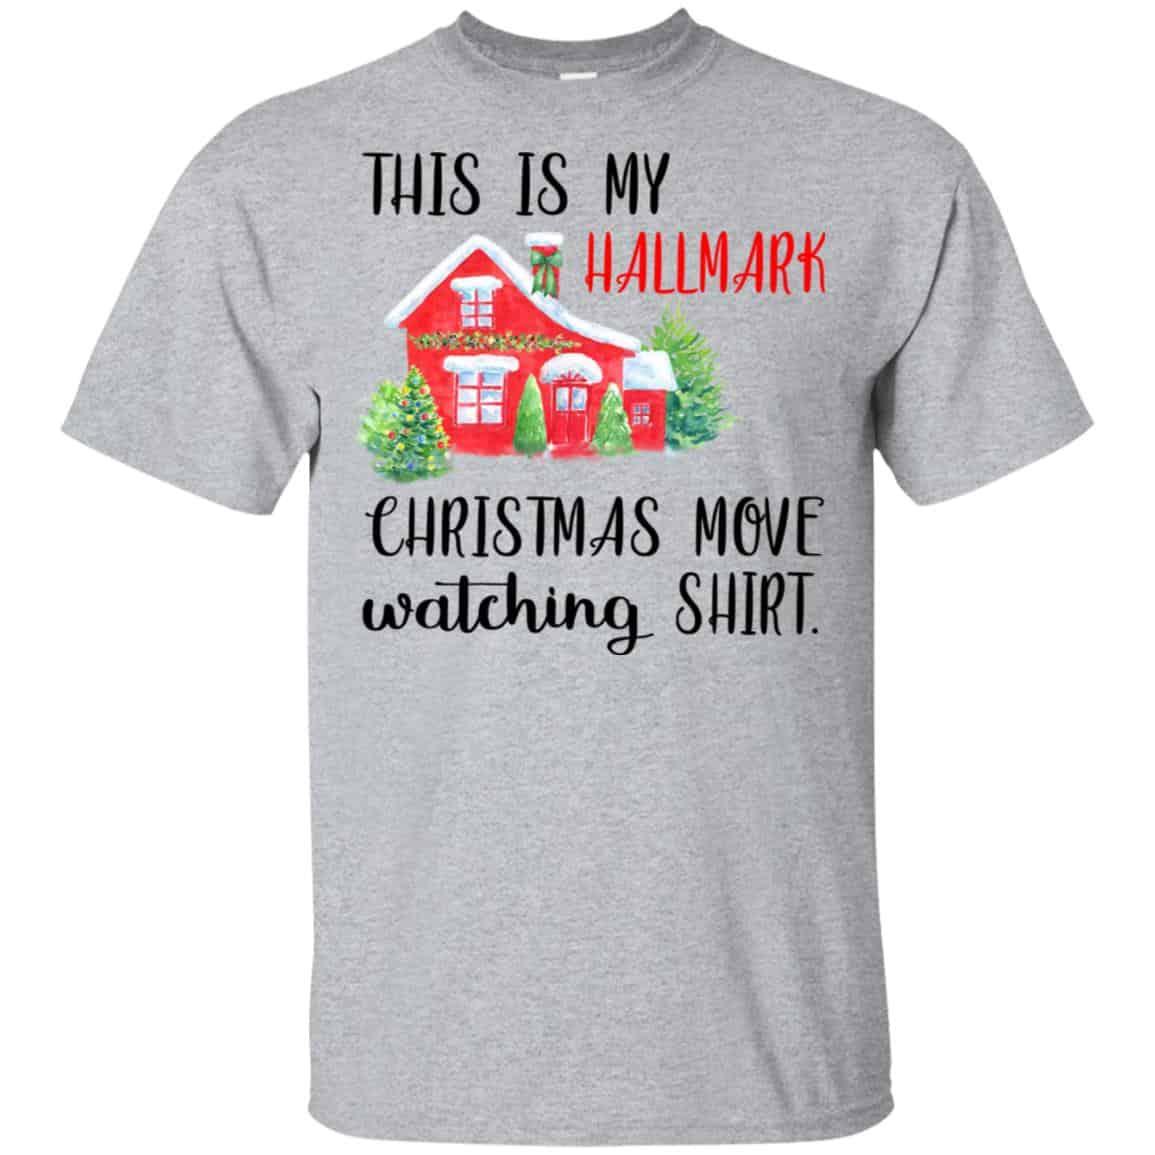 Hallmark Christmas Shirt.This Is My Hallmark Christmas Movie Watching Shirt T Shirts Hoodie Tank